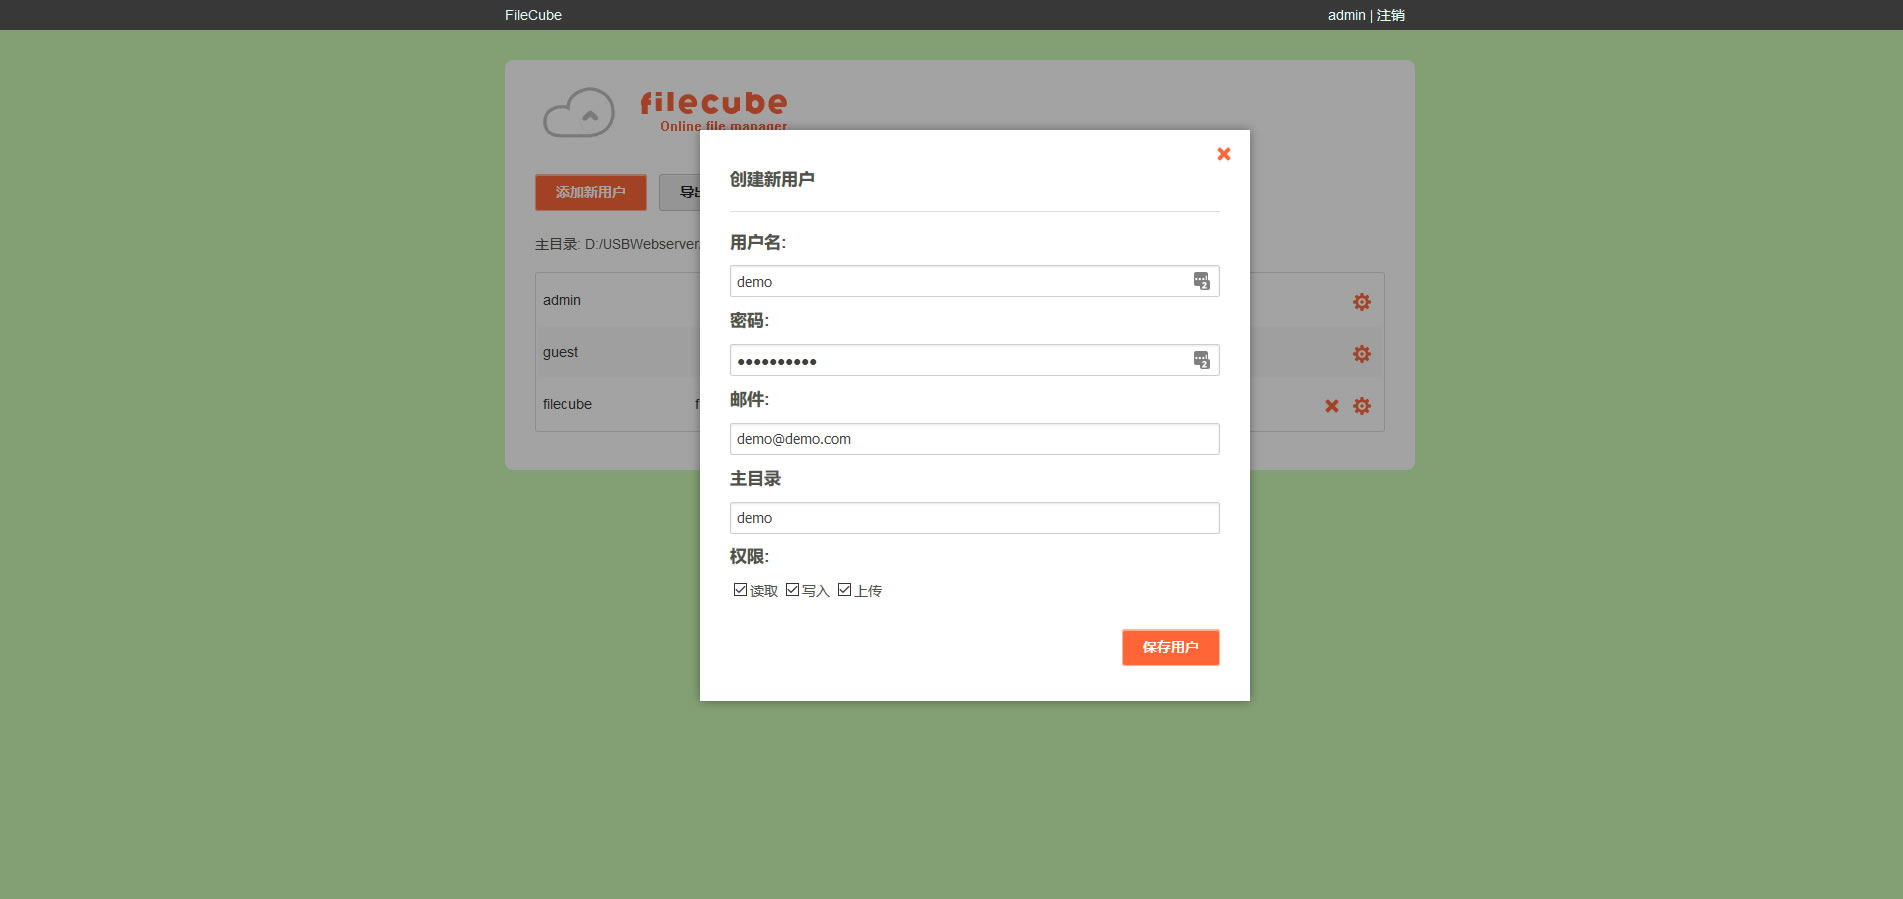 Filecube PHP文件在线管理系统